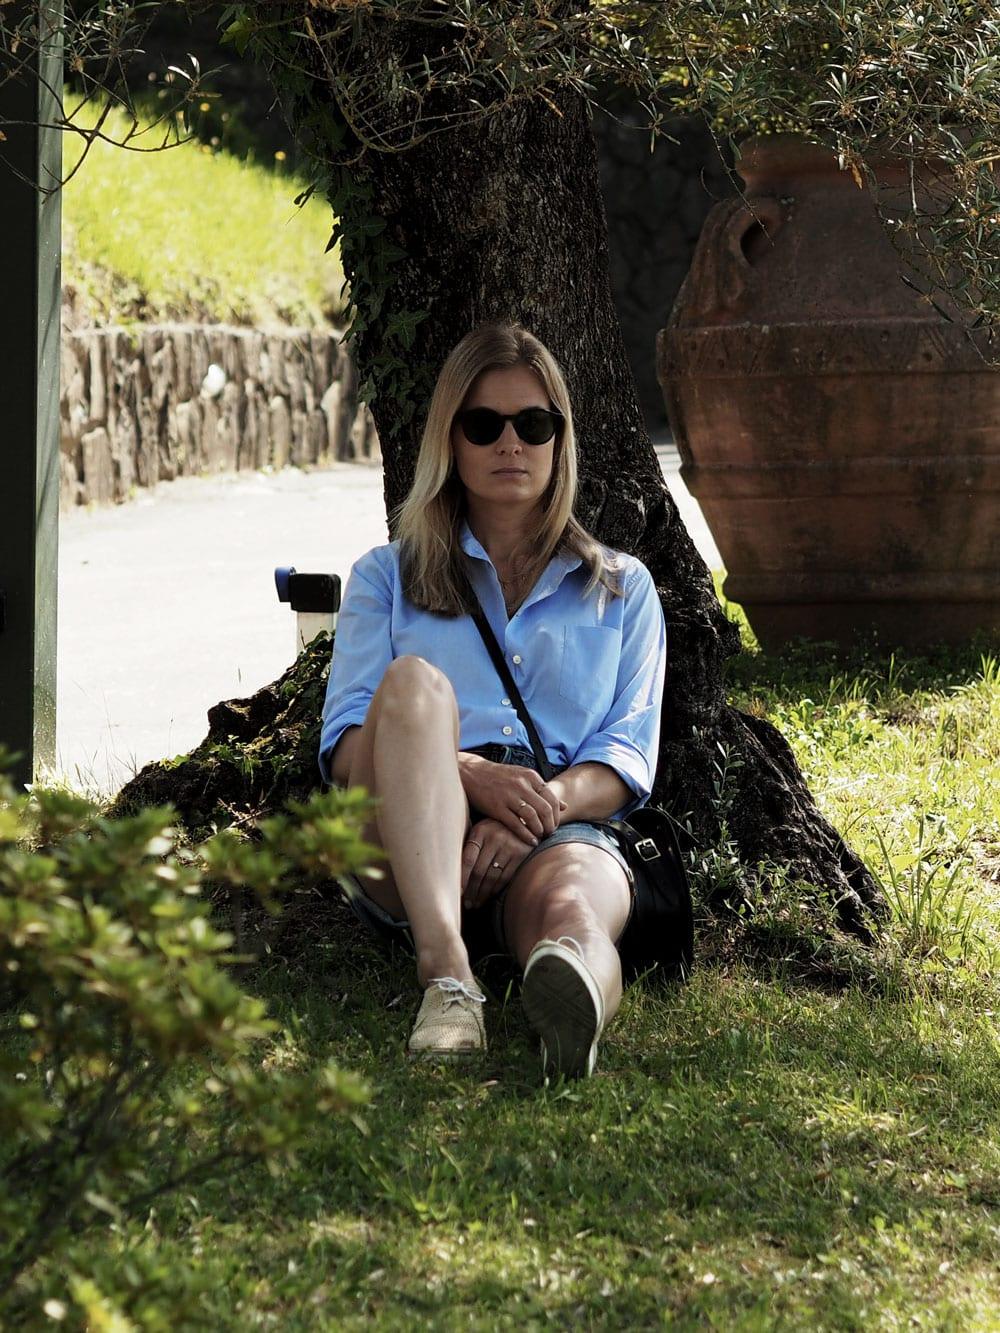 Style&Minimalism   It's Personal   Lucca   Wearing ME+EM blue shirt, AYR denim shorts, Cambridge Satchel Company saddle bag, Robert Clergerie raffia flatforms